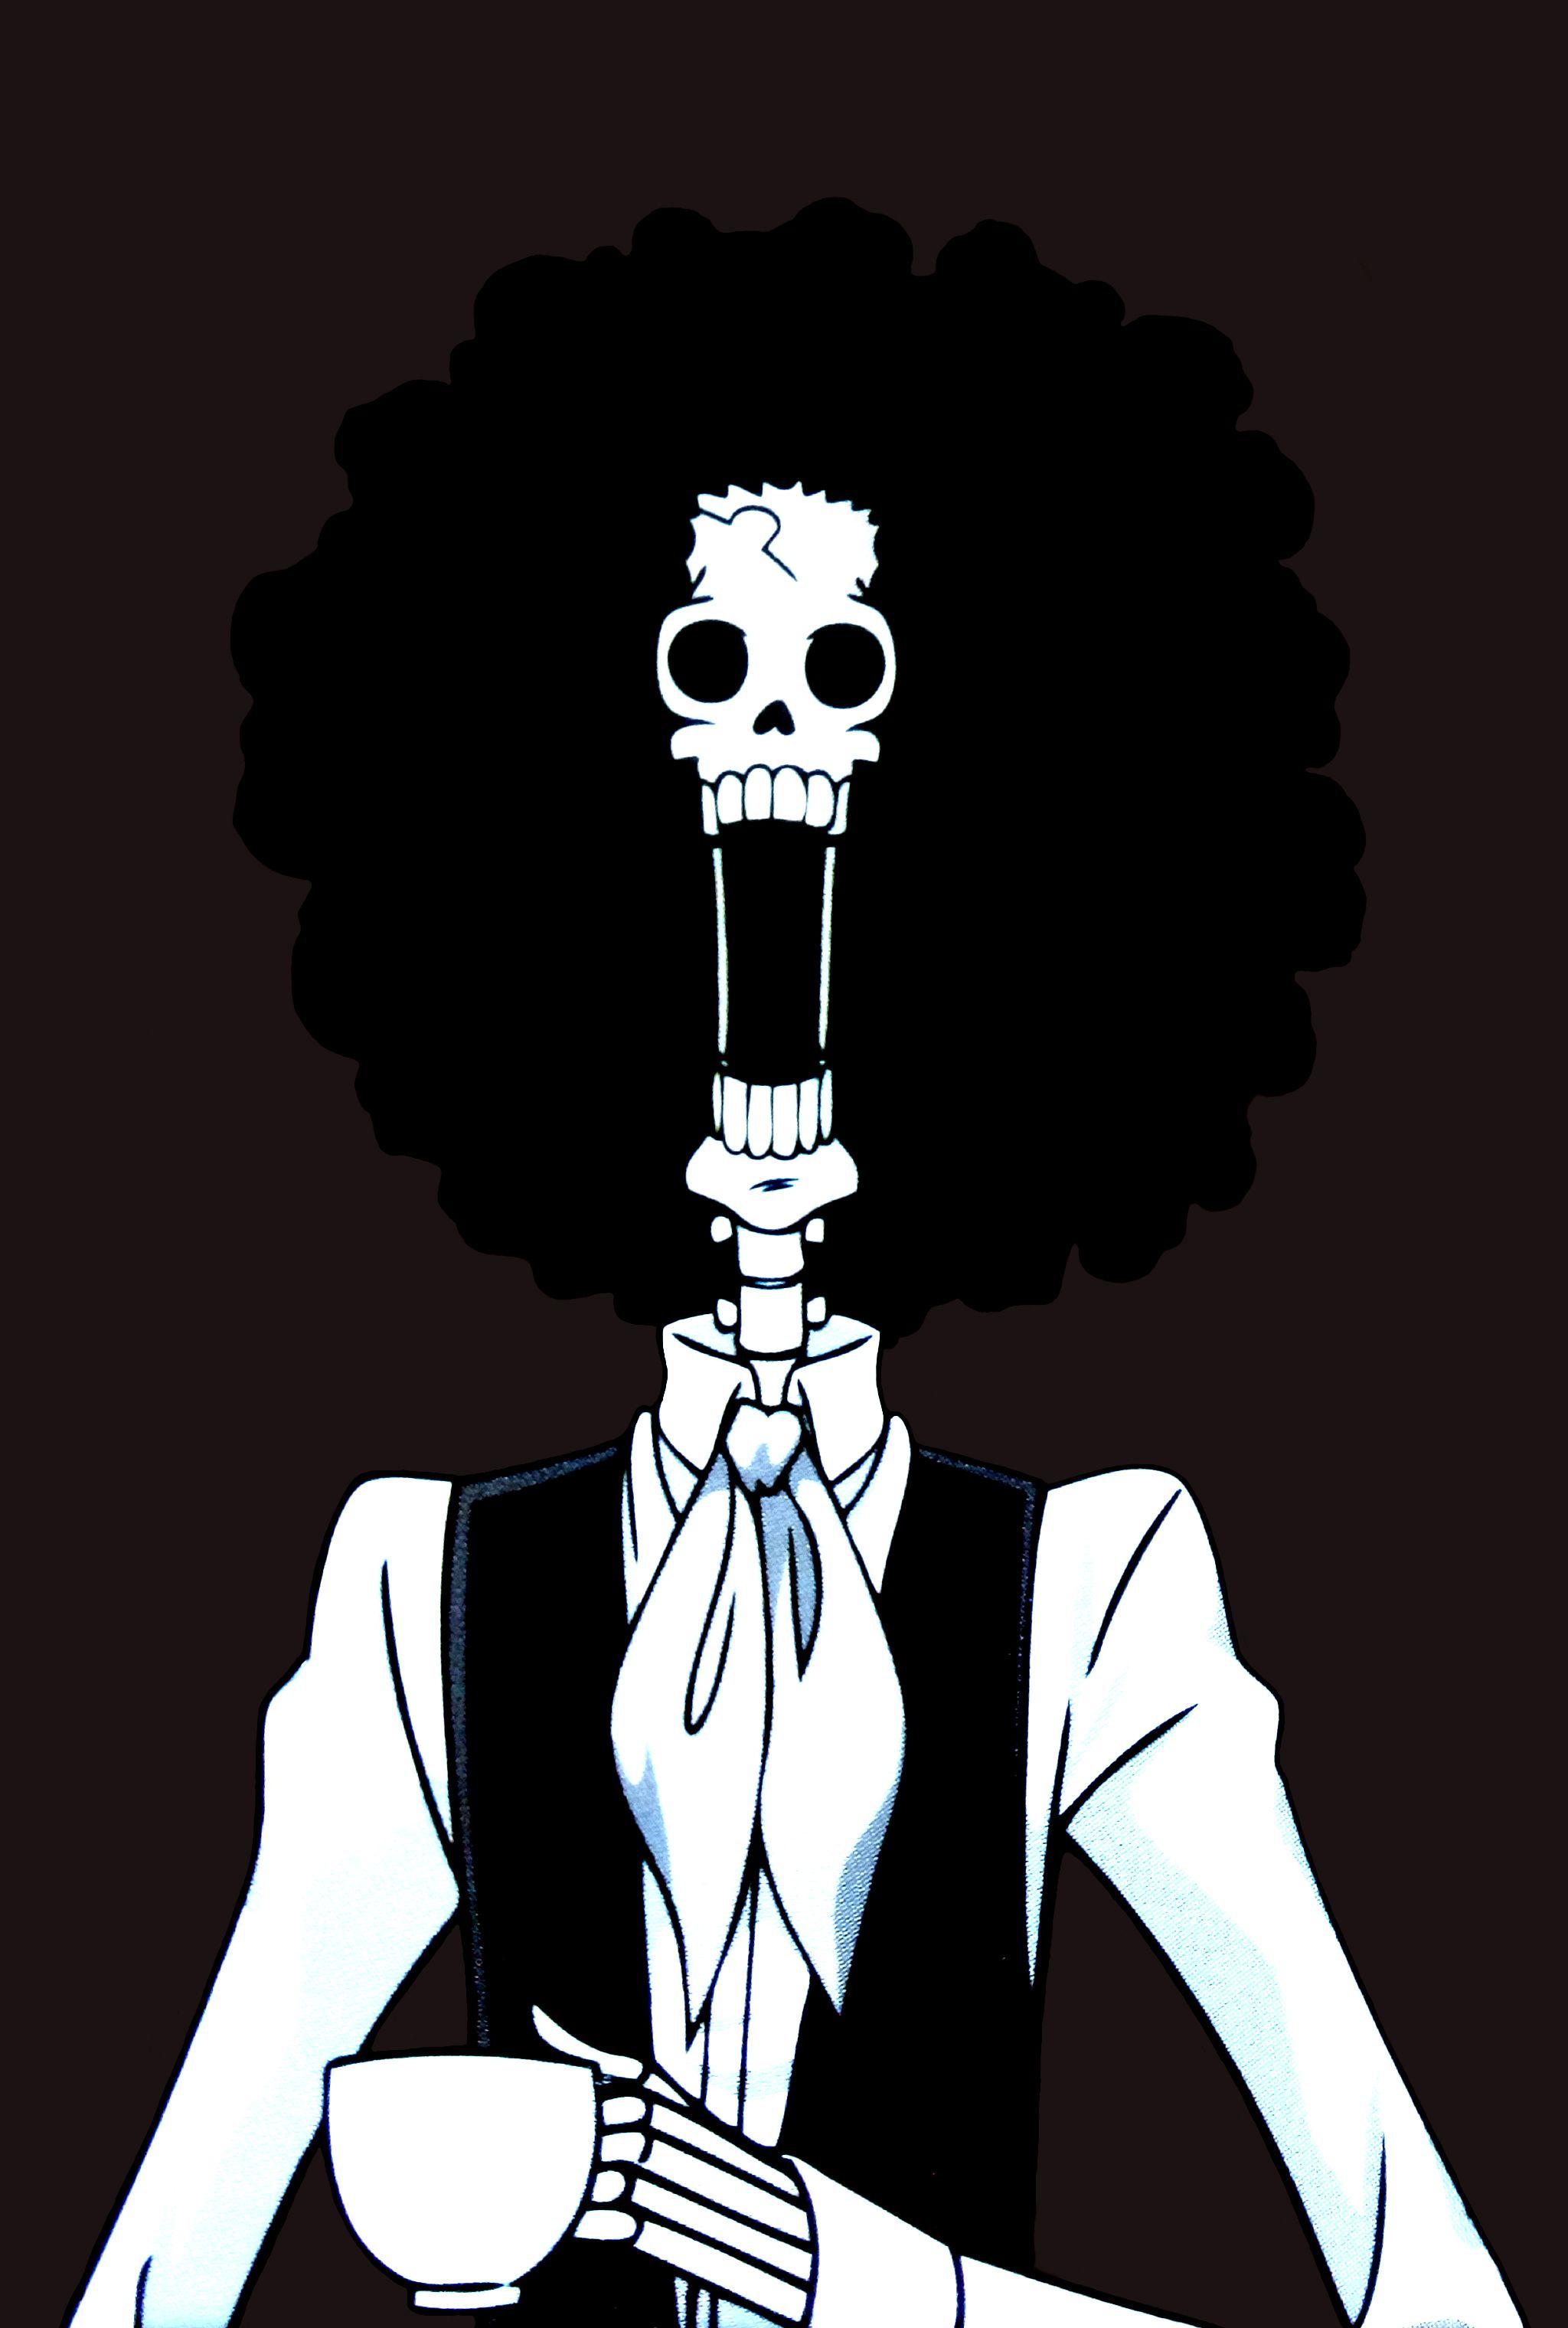 Brook - ONE PIECE - Image #2316349 - Zerochan Anime Image ...